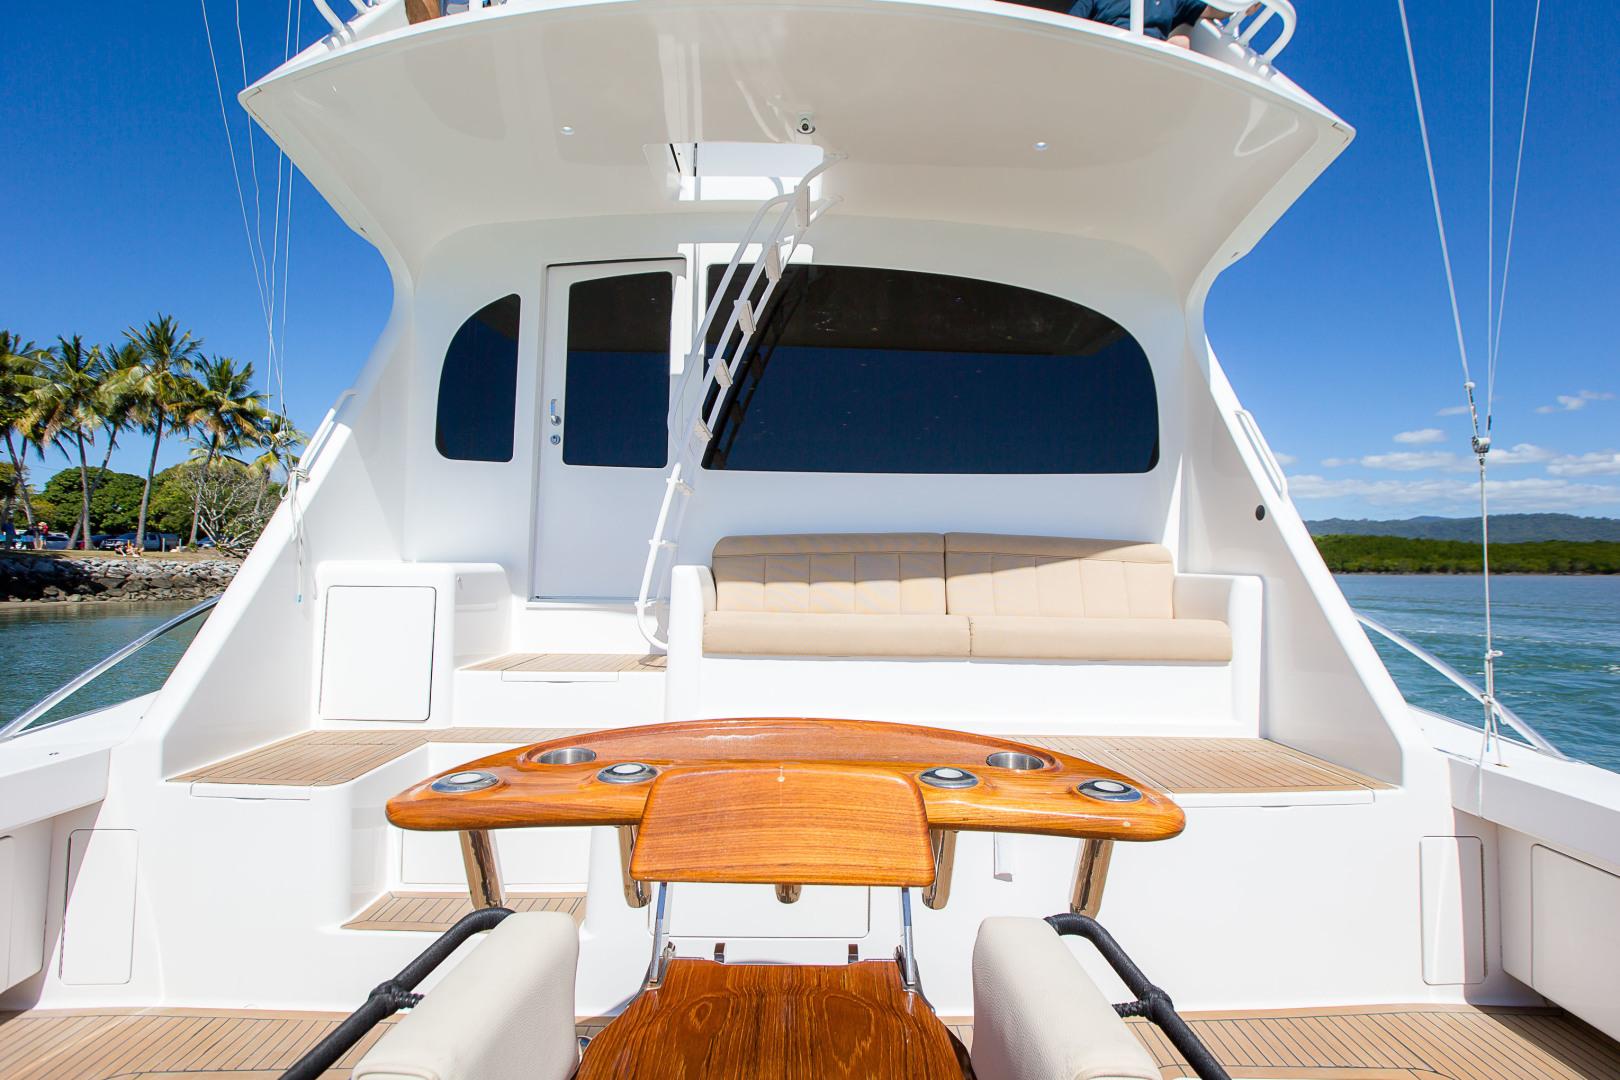 Viking-76 Enclosed Skybridge 2012-Reel Power Palm Beach-Florida-United States-1346551   Thumbnail